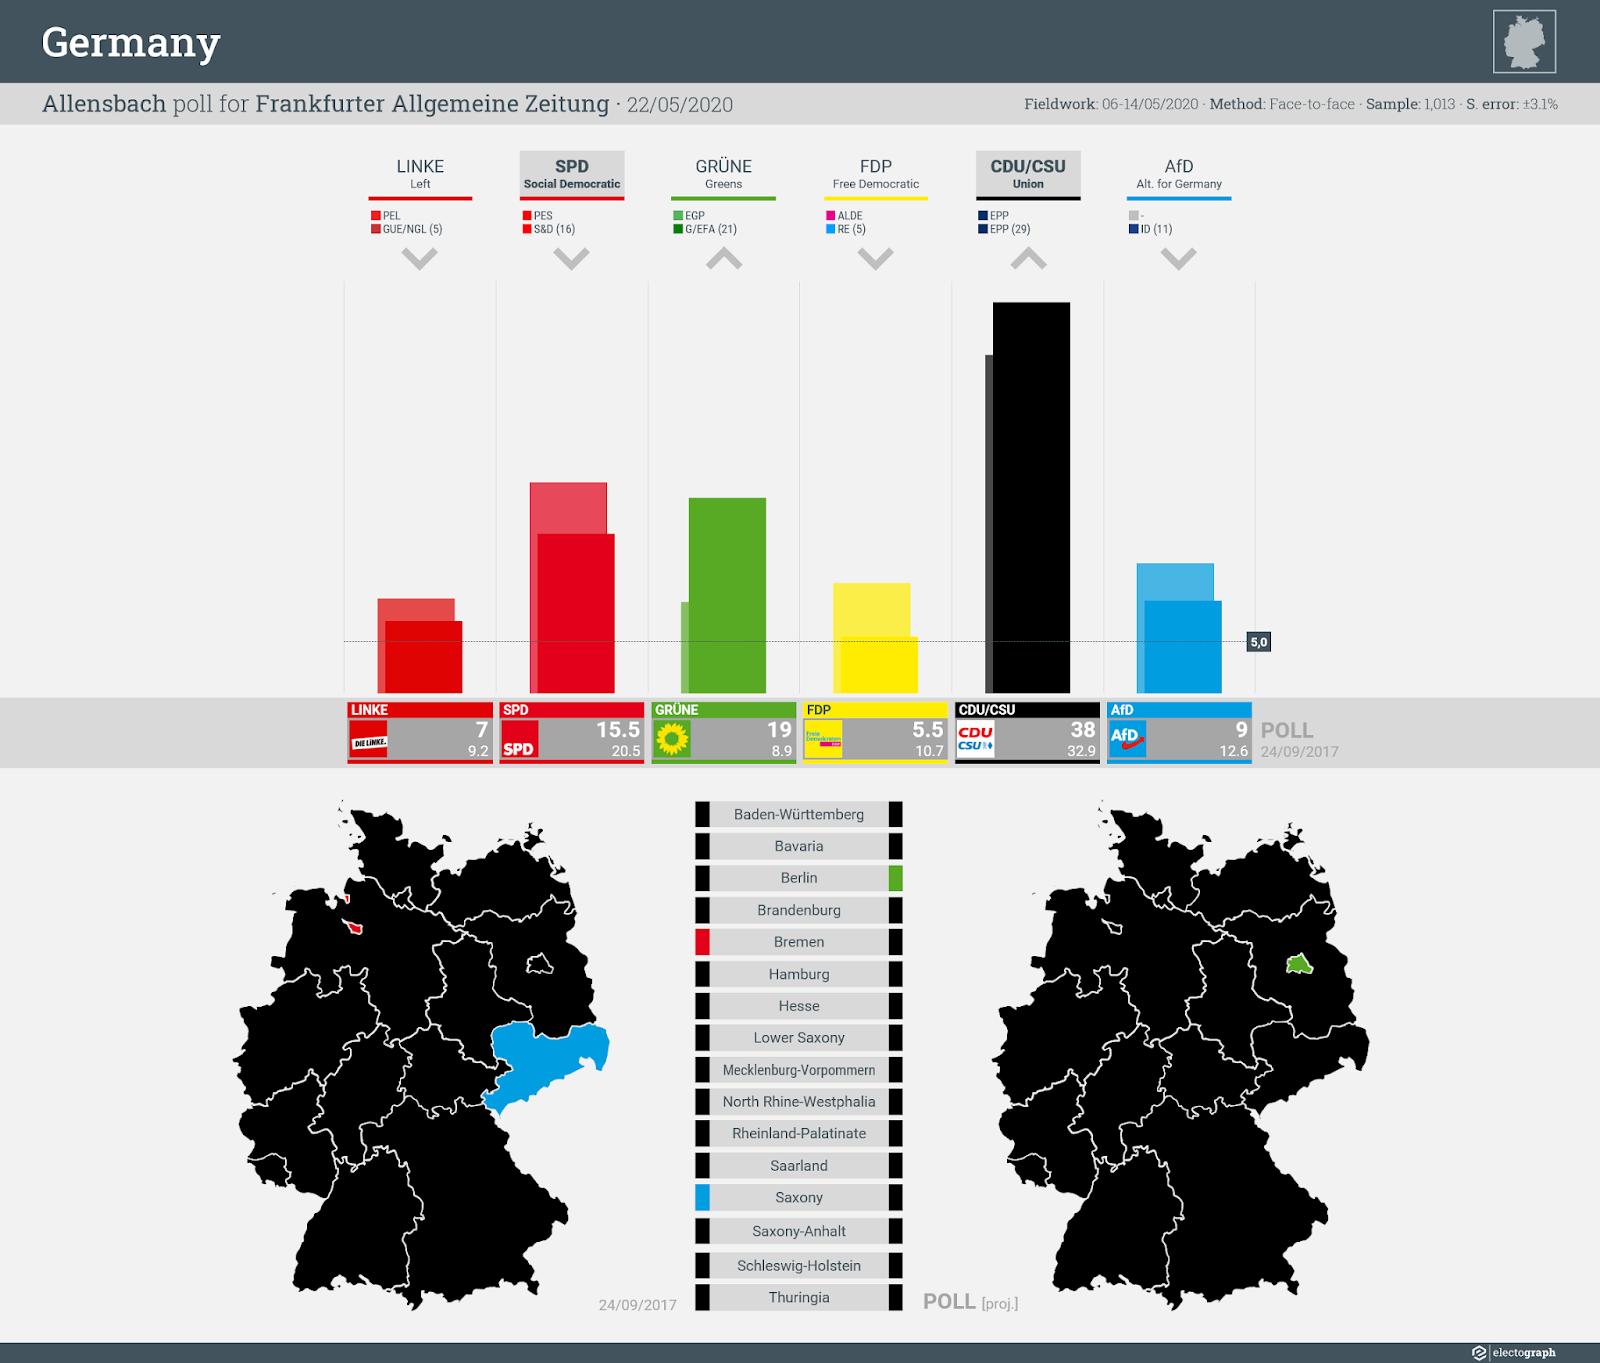 GERMANY: Allensbach poll chart for Frankfurter Allgemeine Zeitung, 22 May 2020